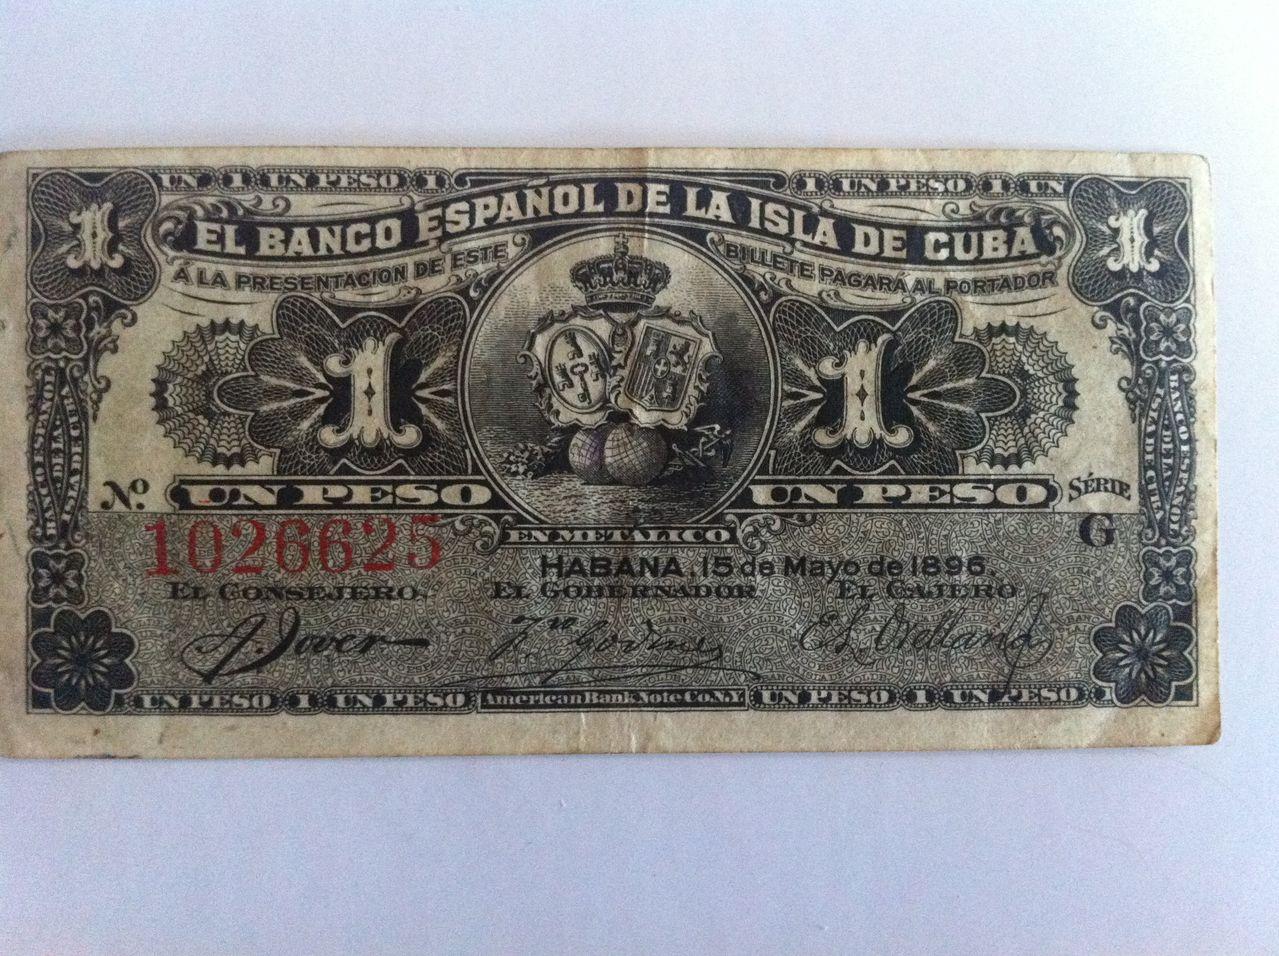 Ayuda valoracion 1 peso español de la Isla de Cuba 1896 IMG_4973